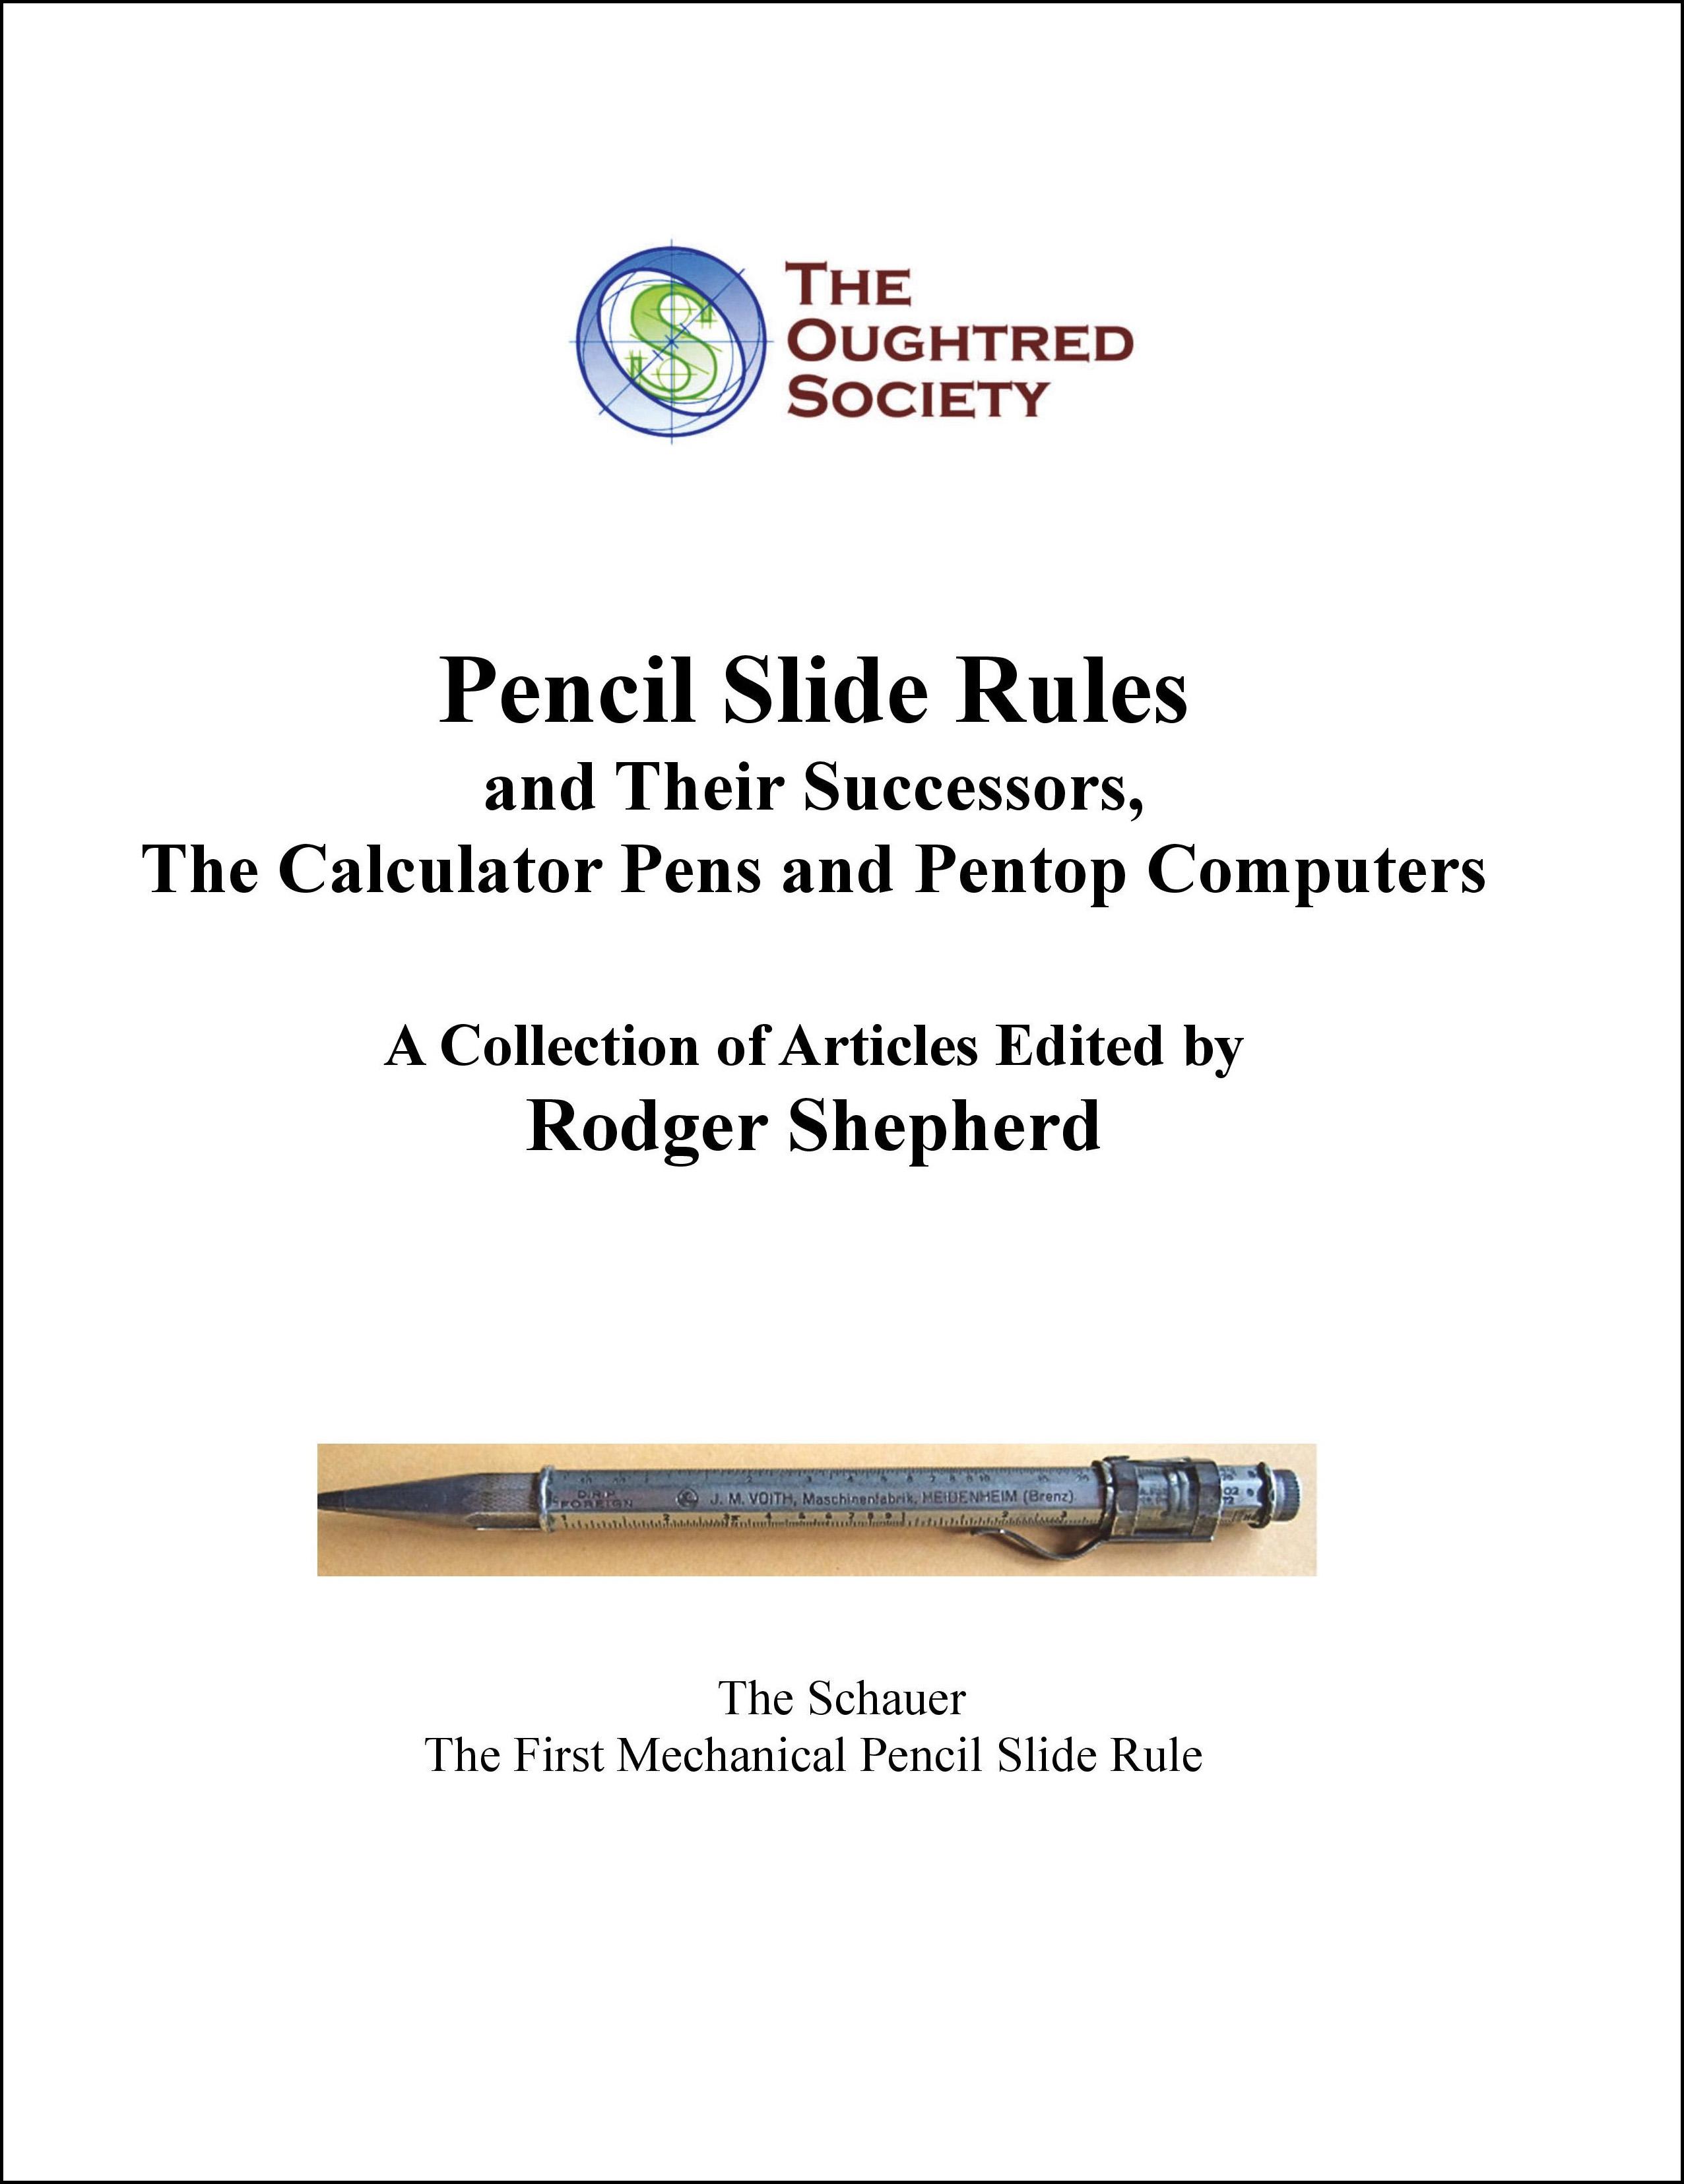 Pencil Slide Rules